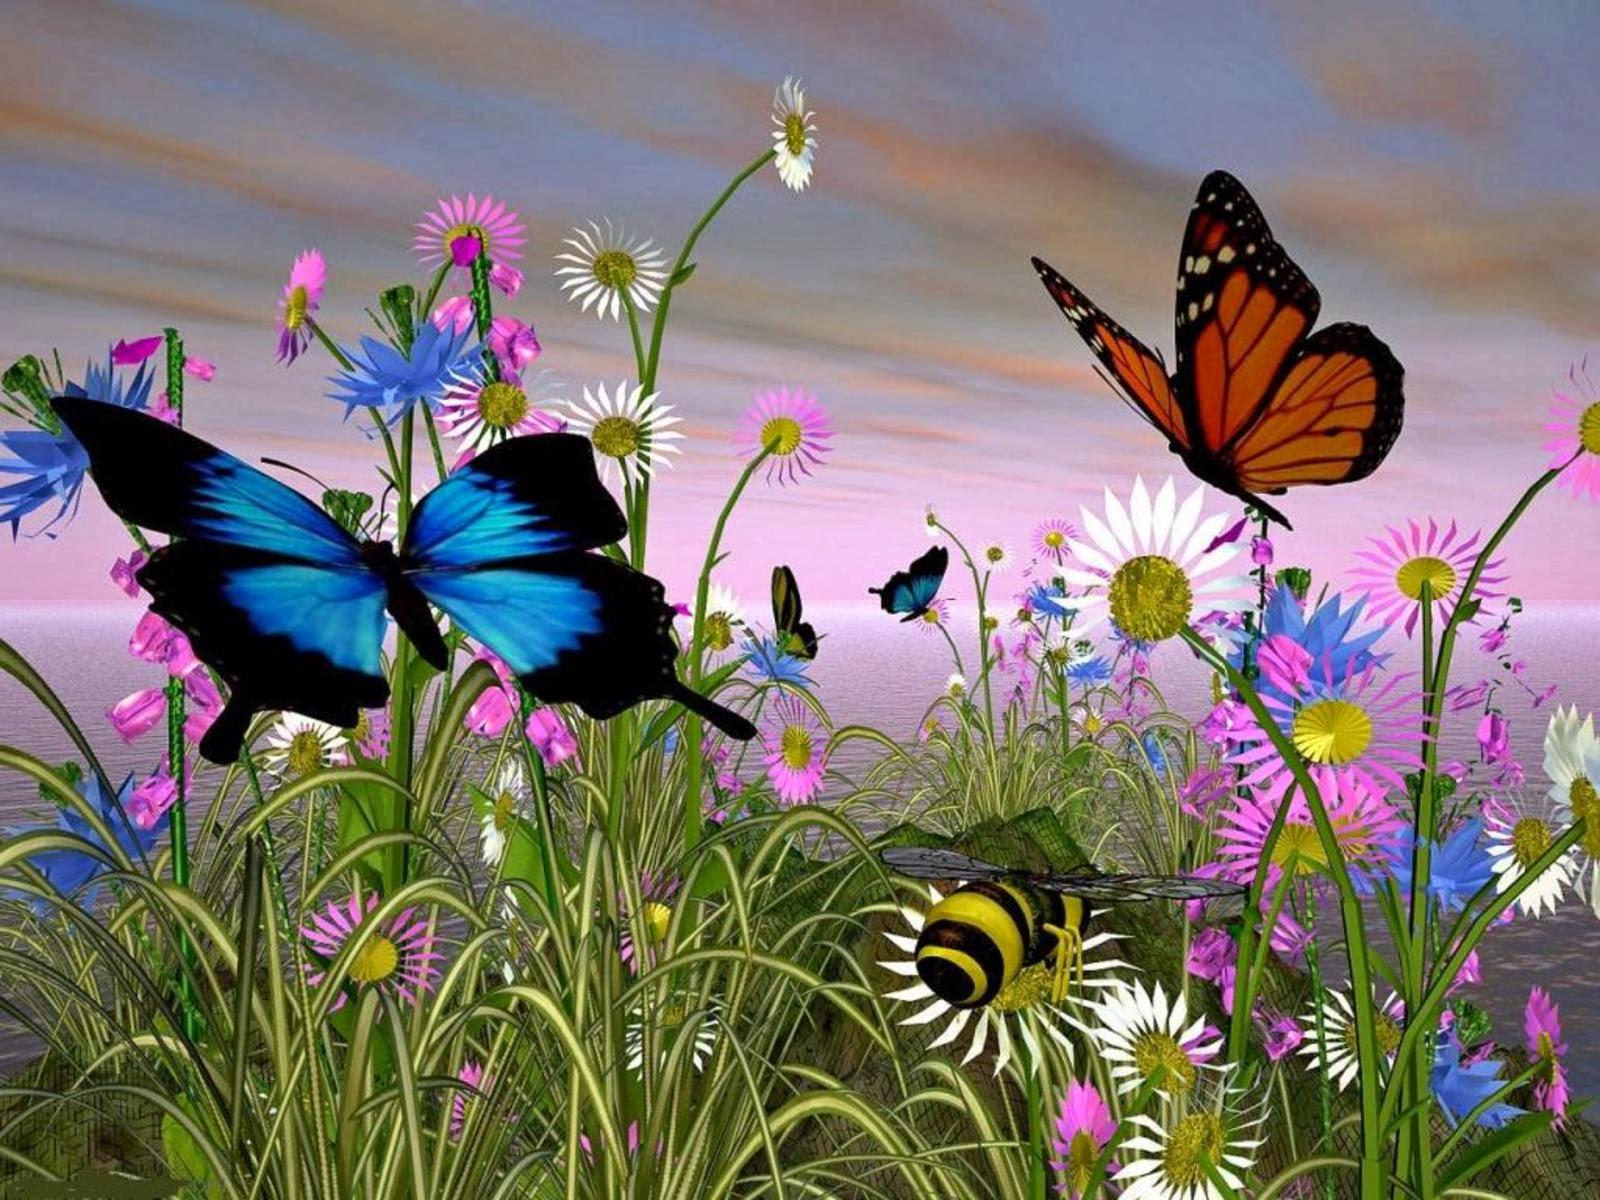 One Hundred Wallpaper: Butterfly Wallpaper HD Cool